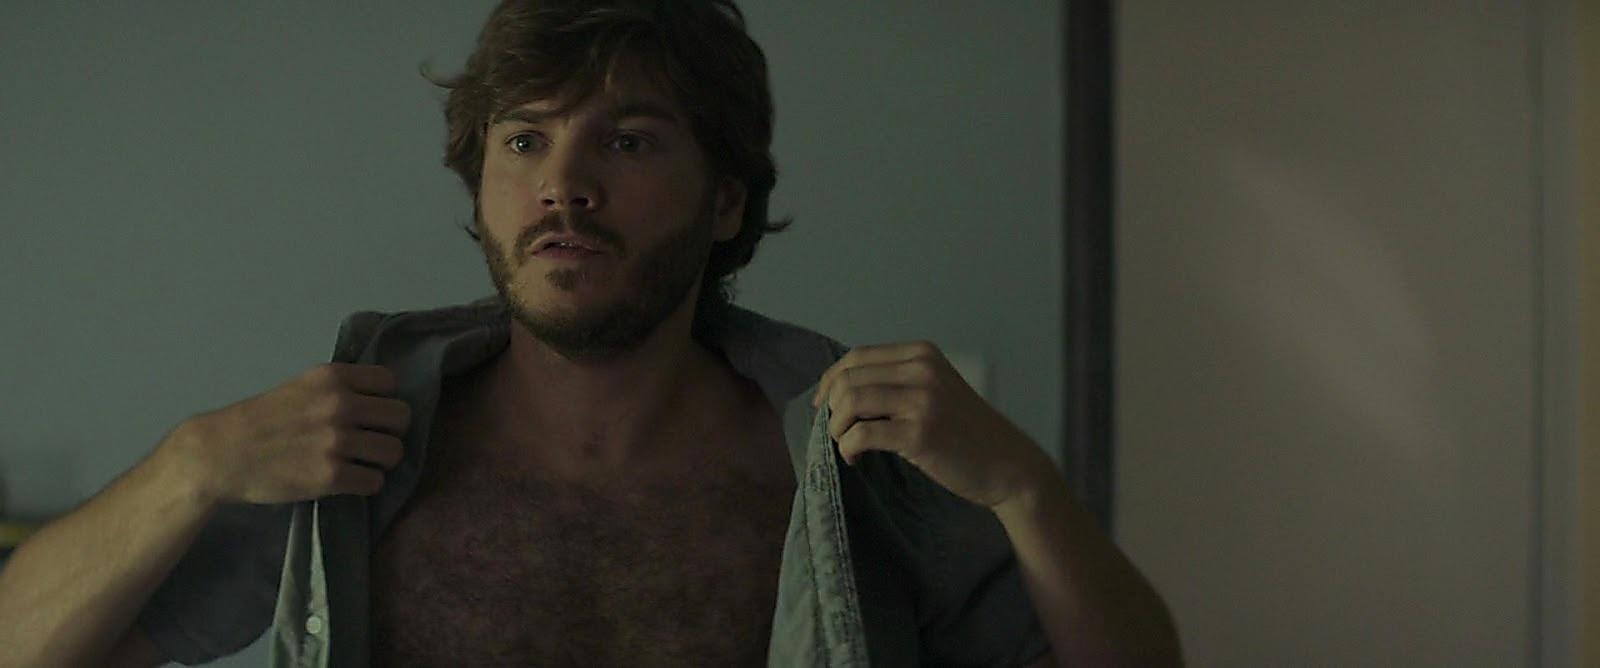 Emile Hirsch sexy shirtless scene March 25, 2017, 1pm